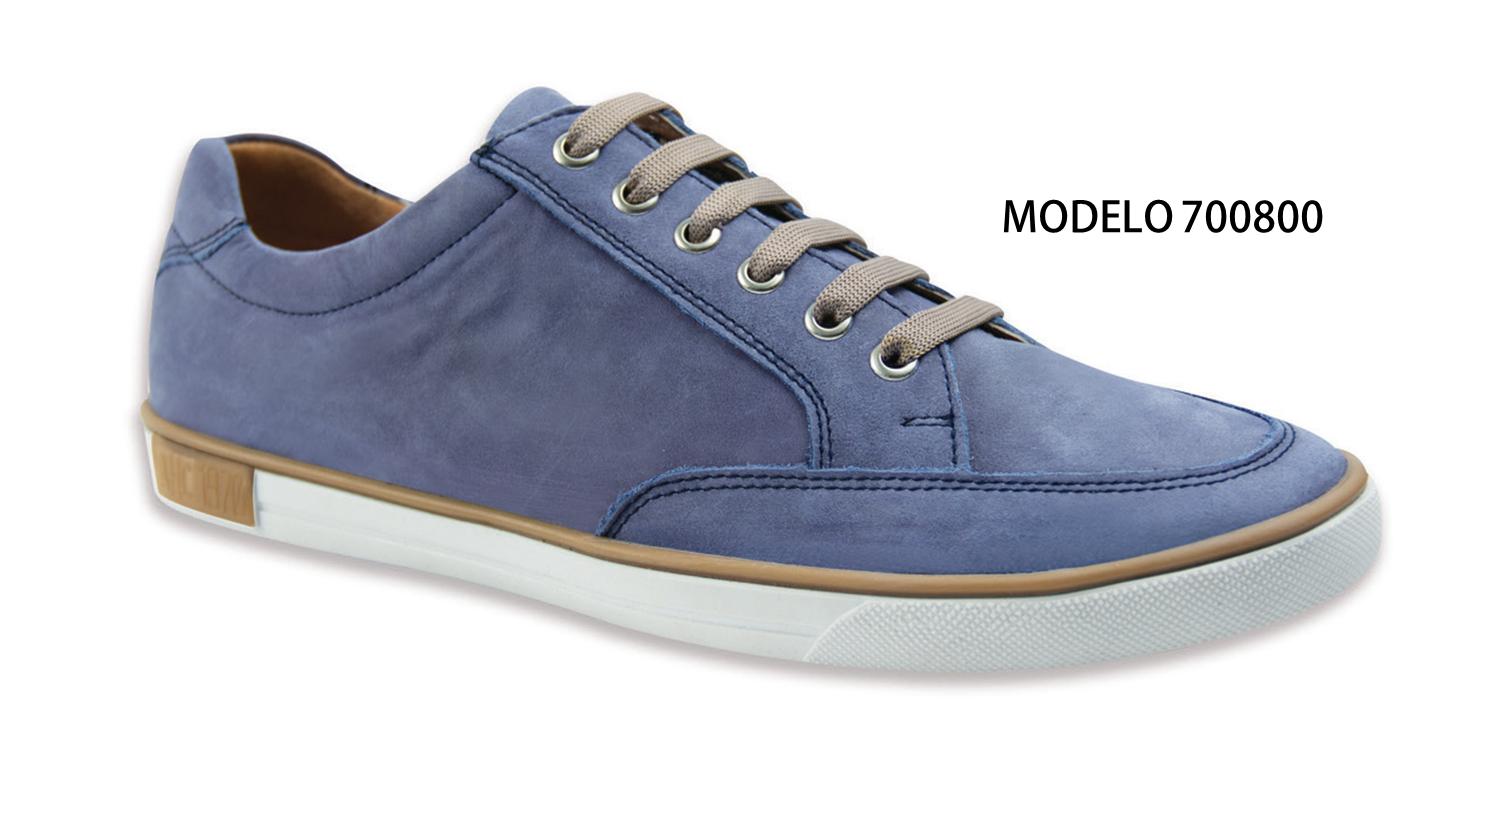 104e612c tenis para hombre casual tennis shoes for men tallas 25 al 30  ventas@firmaindependiente.com